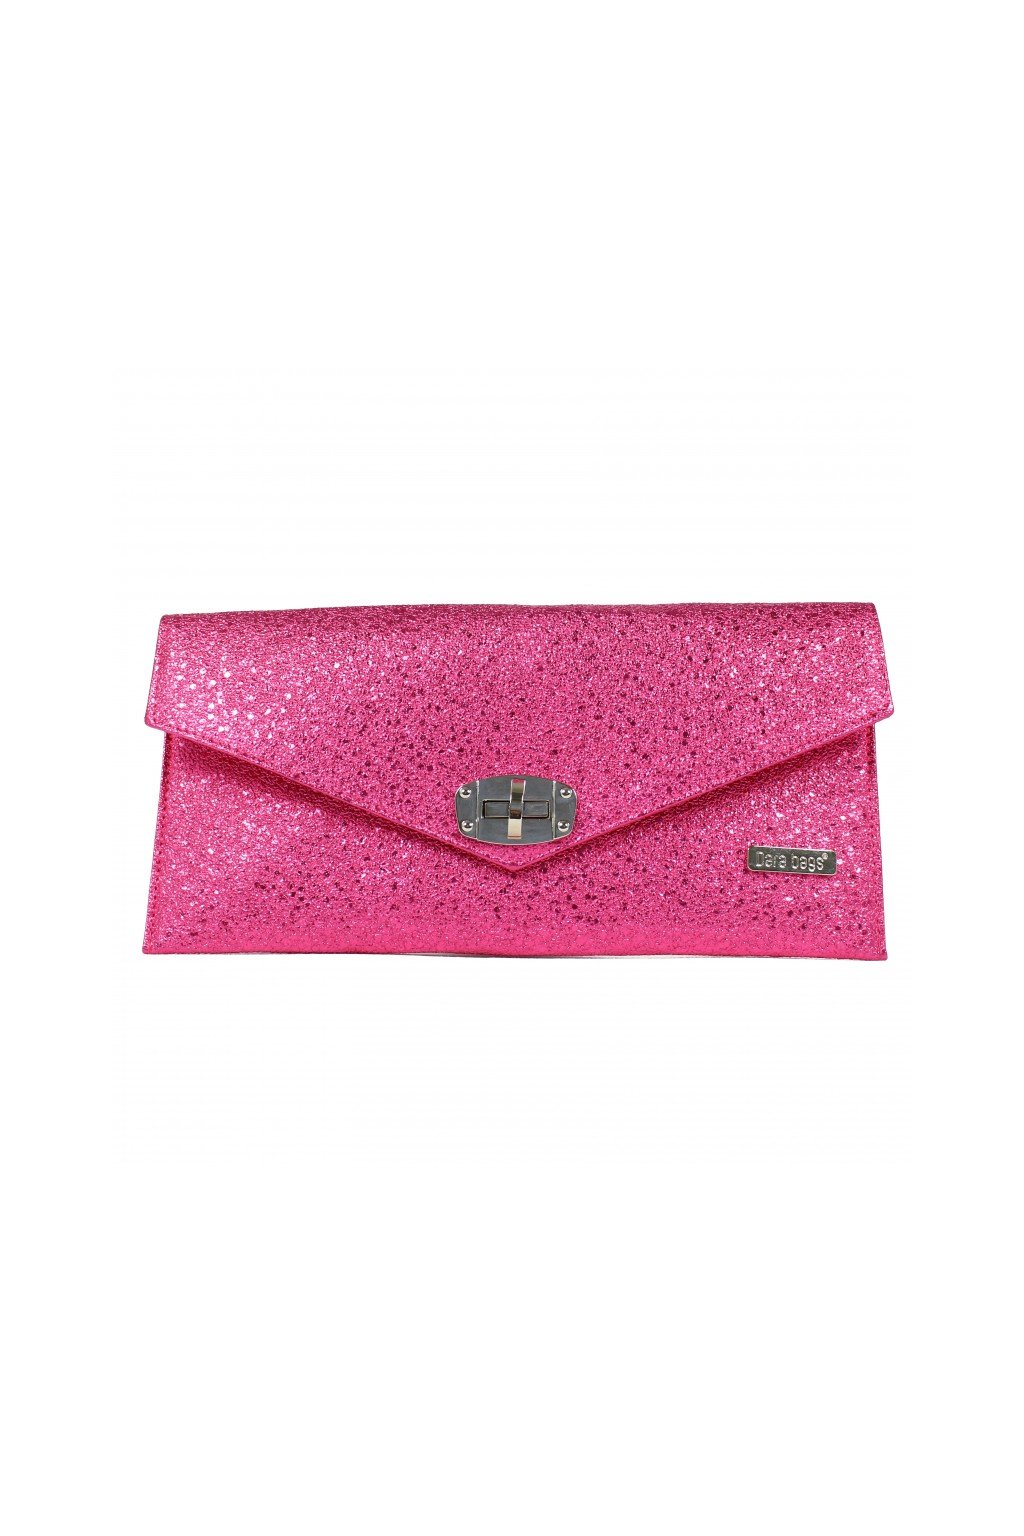 Malá třpytivá kabelka Malibu Classy Dara bags růžová 1